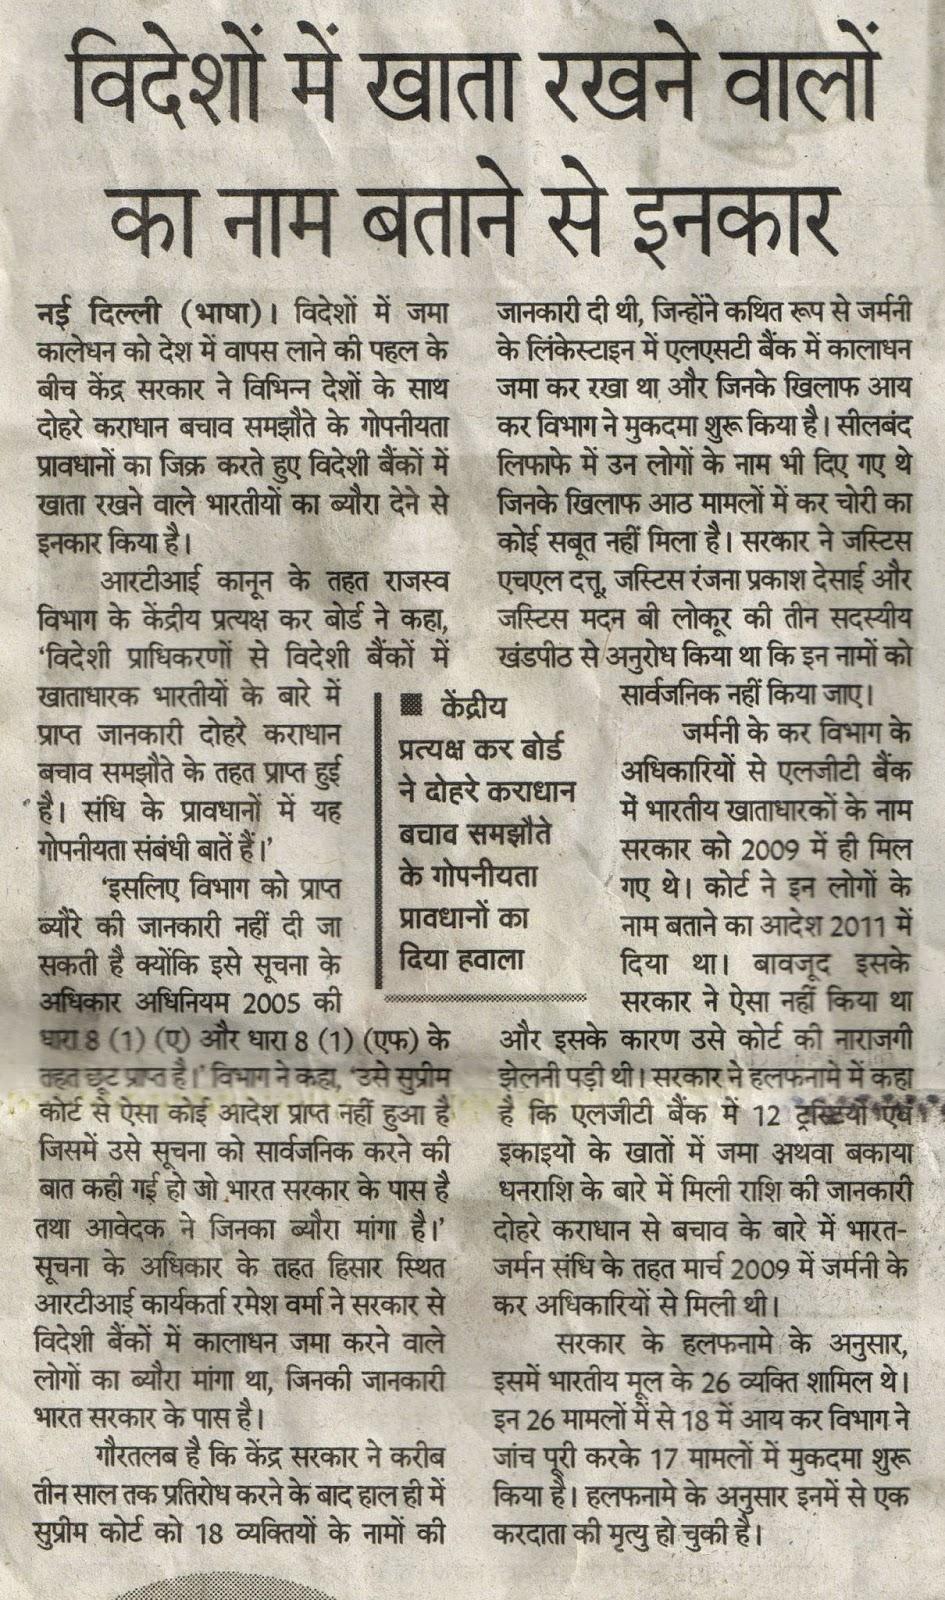 black money rti information story by ramesh verma hisar right to information regarding black money narender modi govt